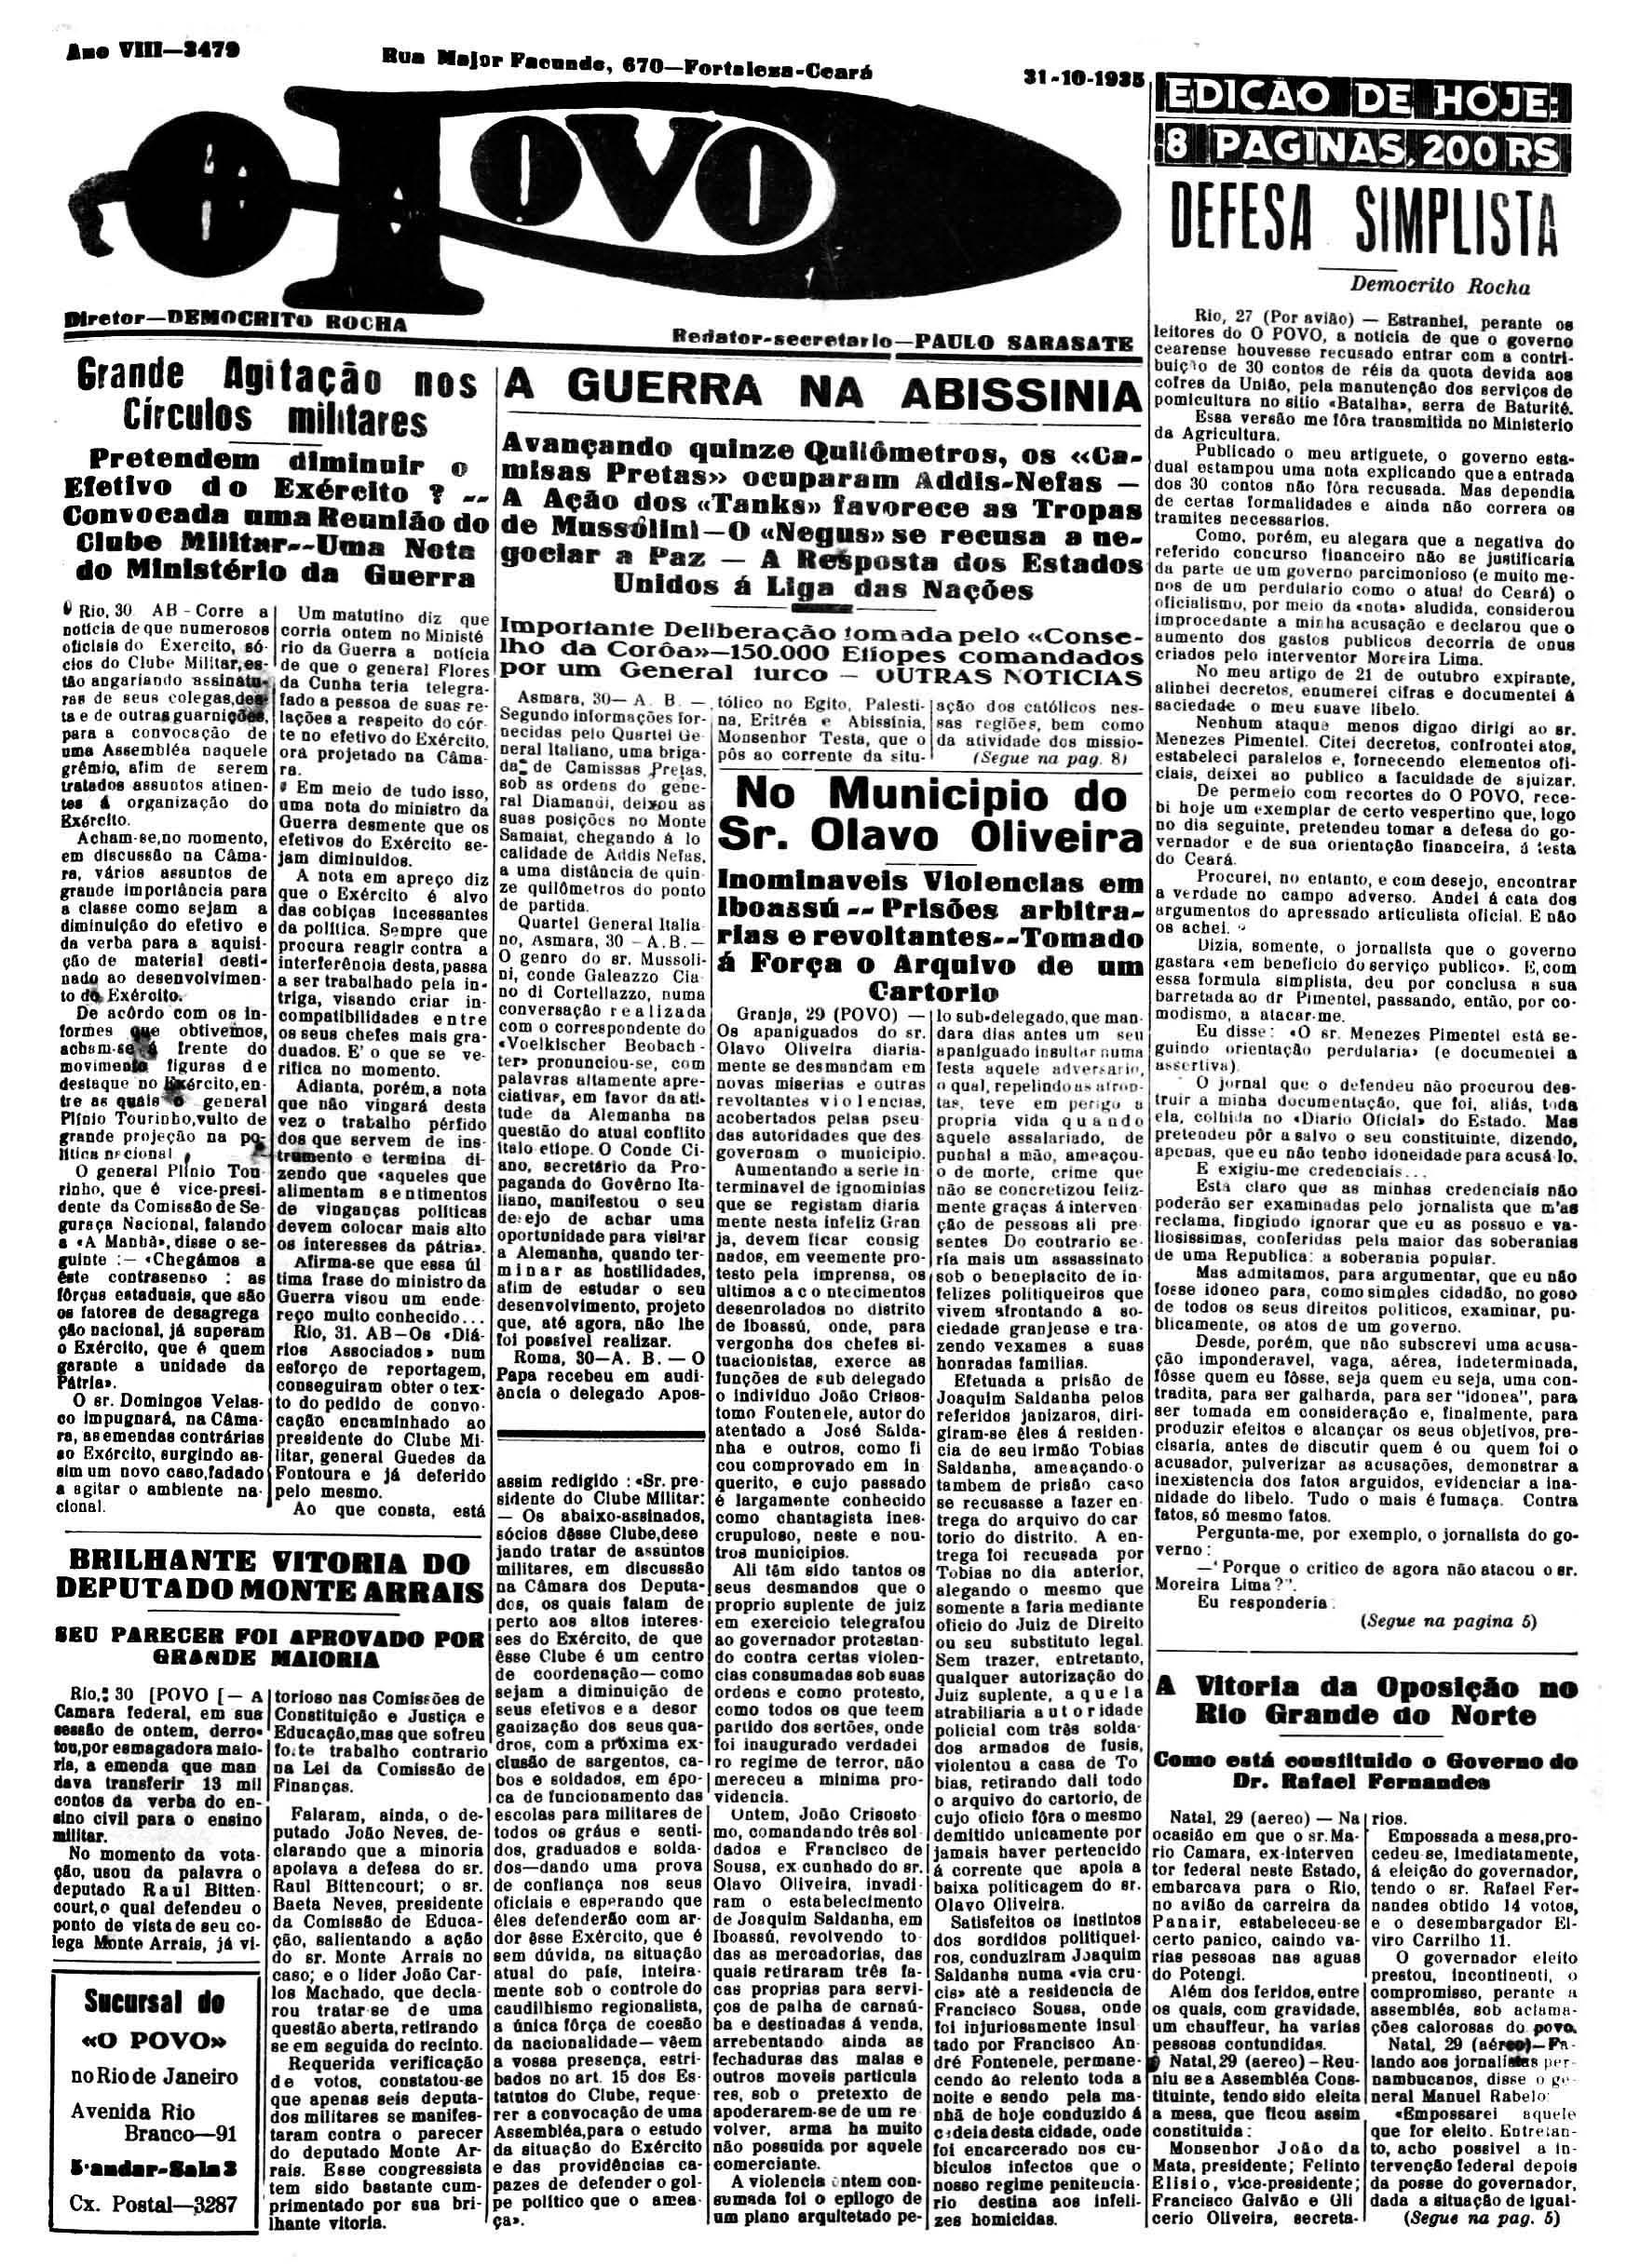 31-10-1935